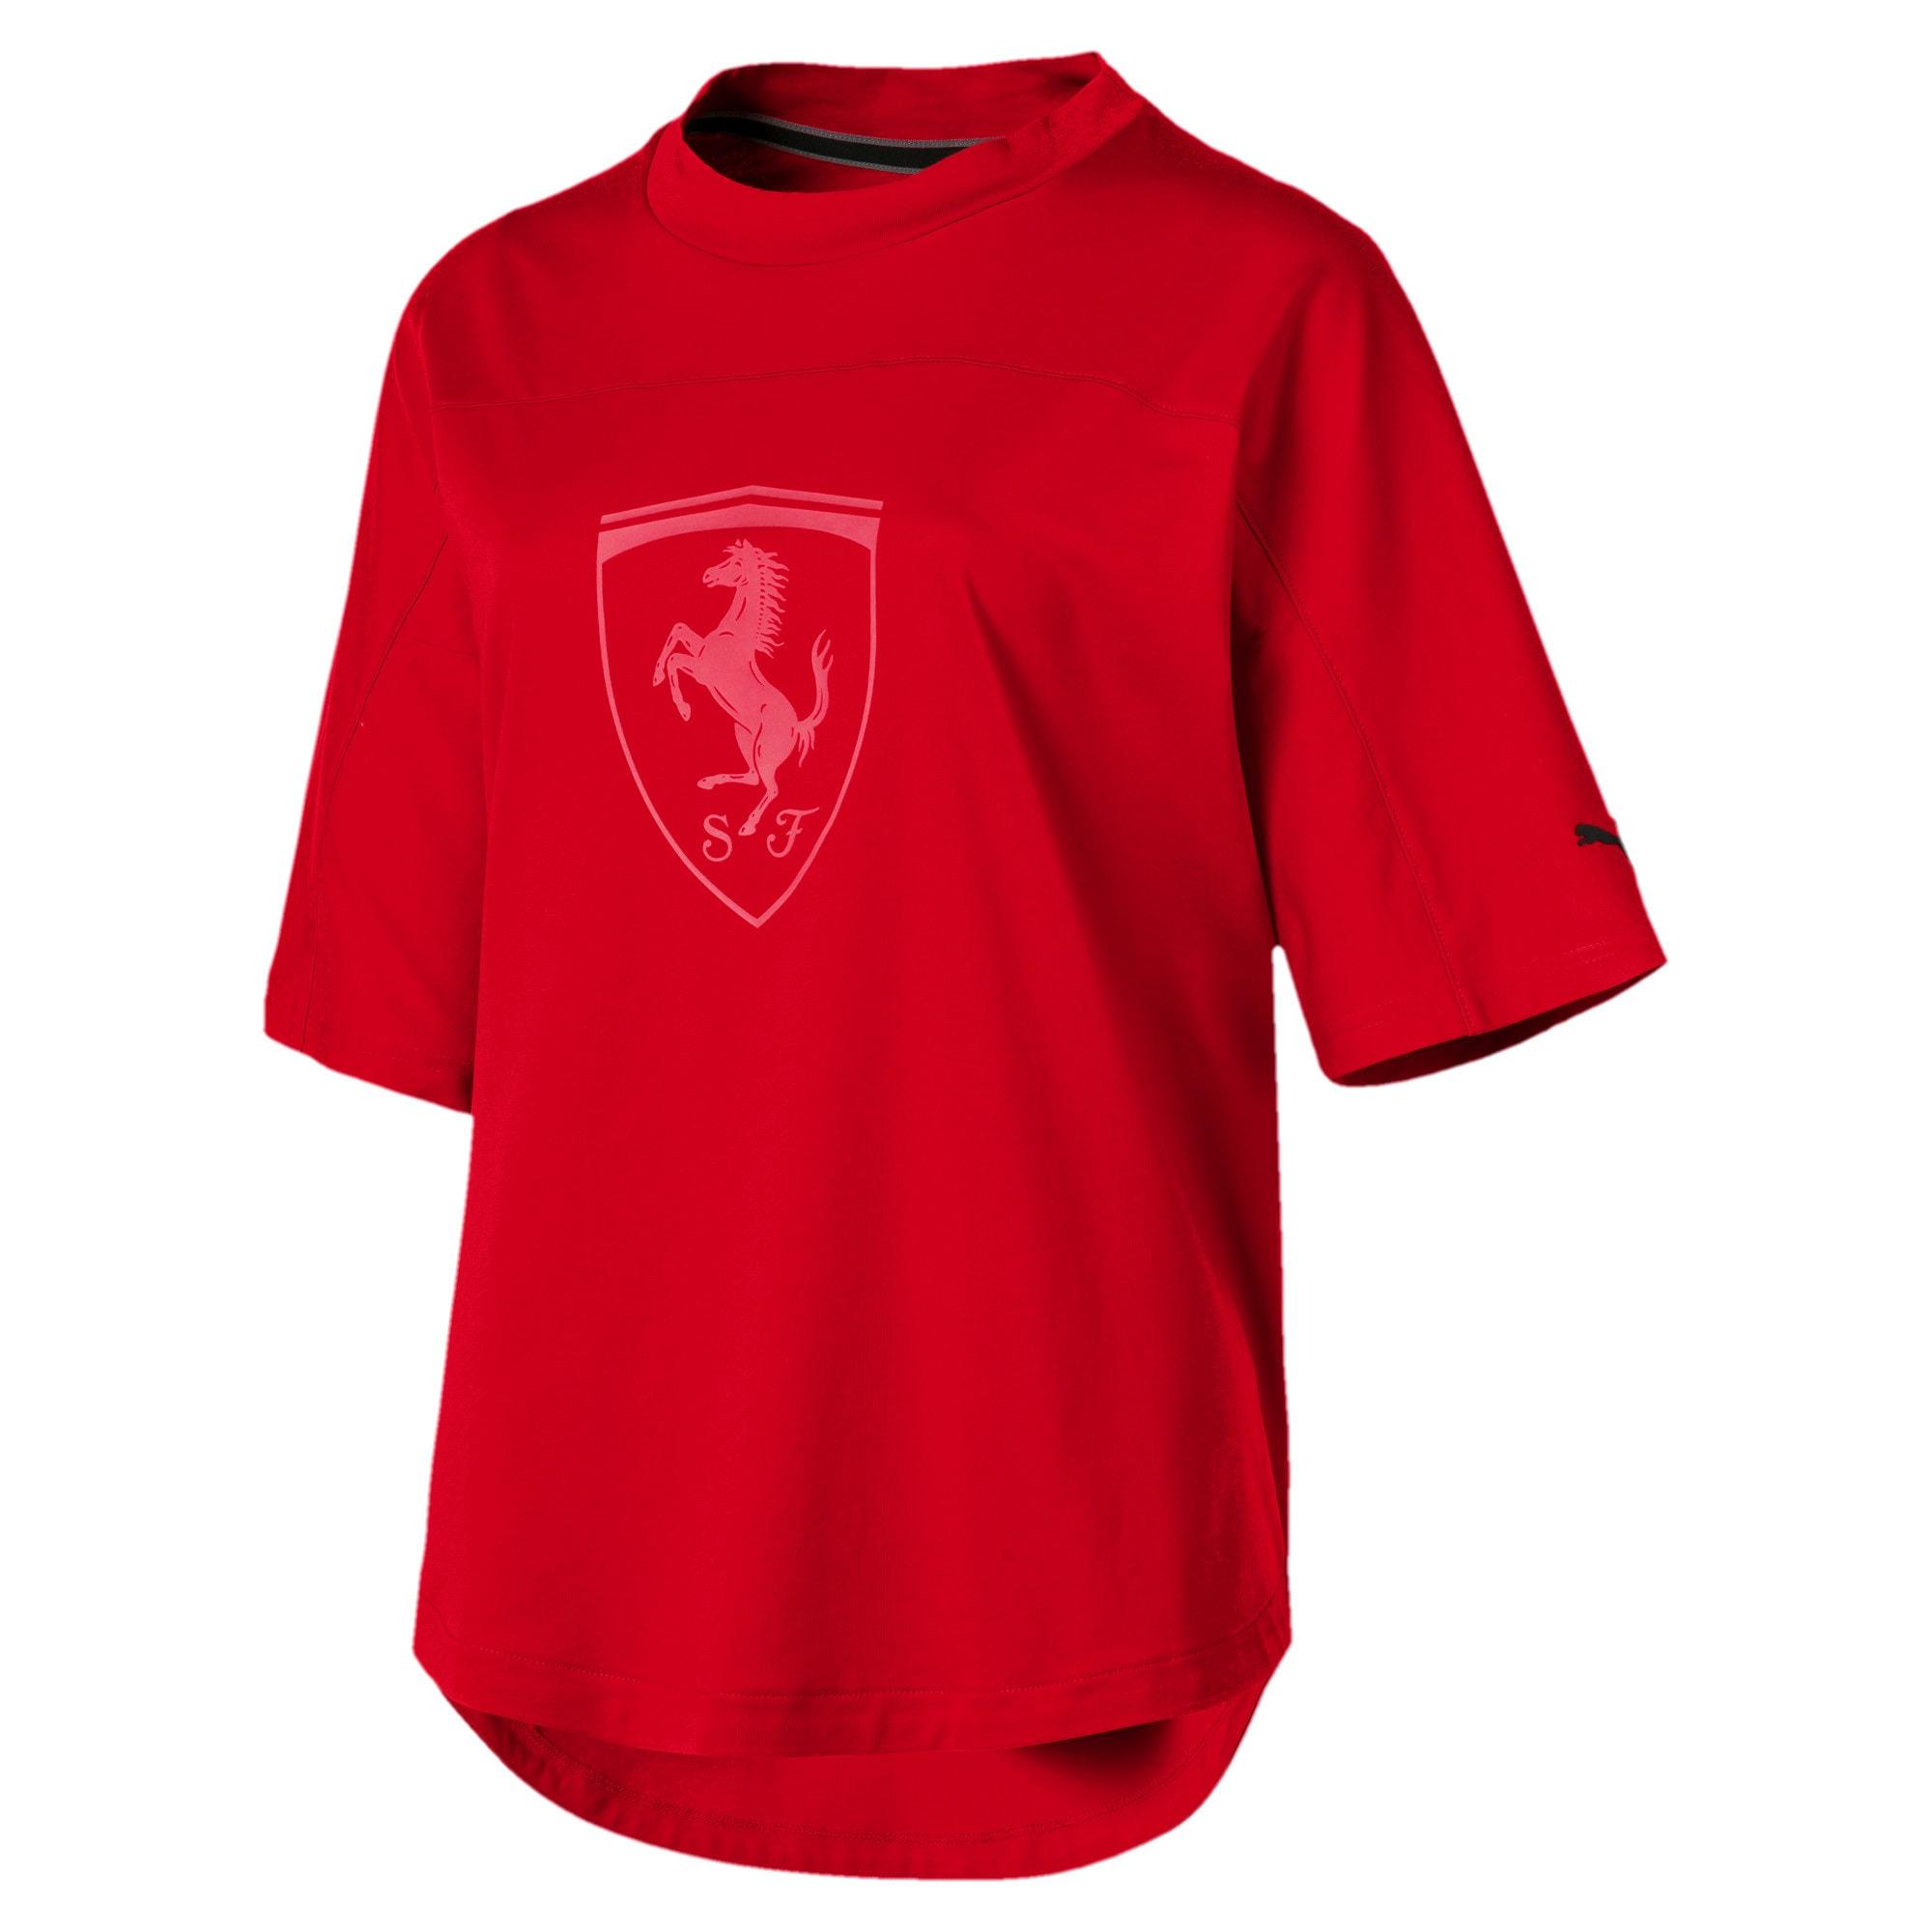 Thumbnail 4 of T-shirt con stemma grande Ferrari donna, Rosso Corsa, medium